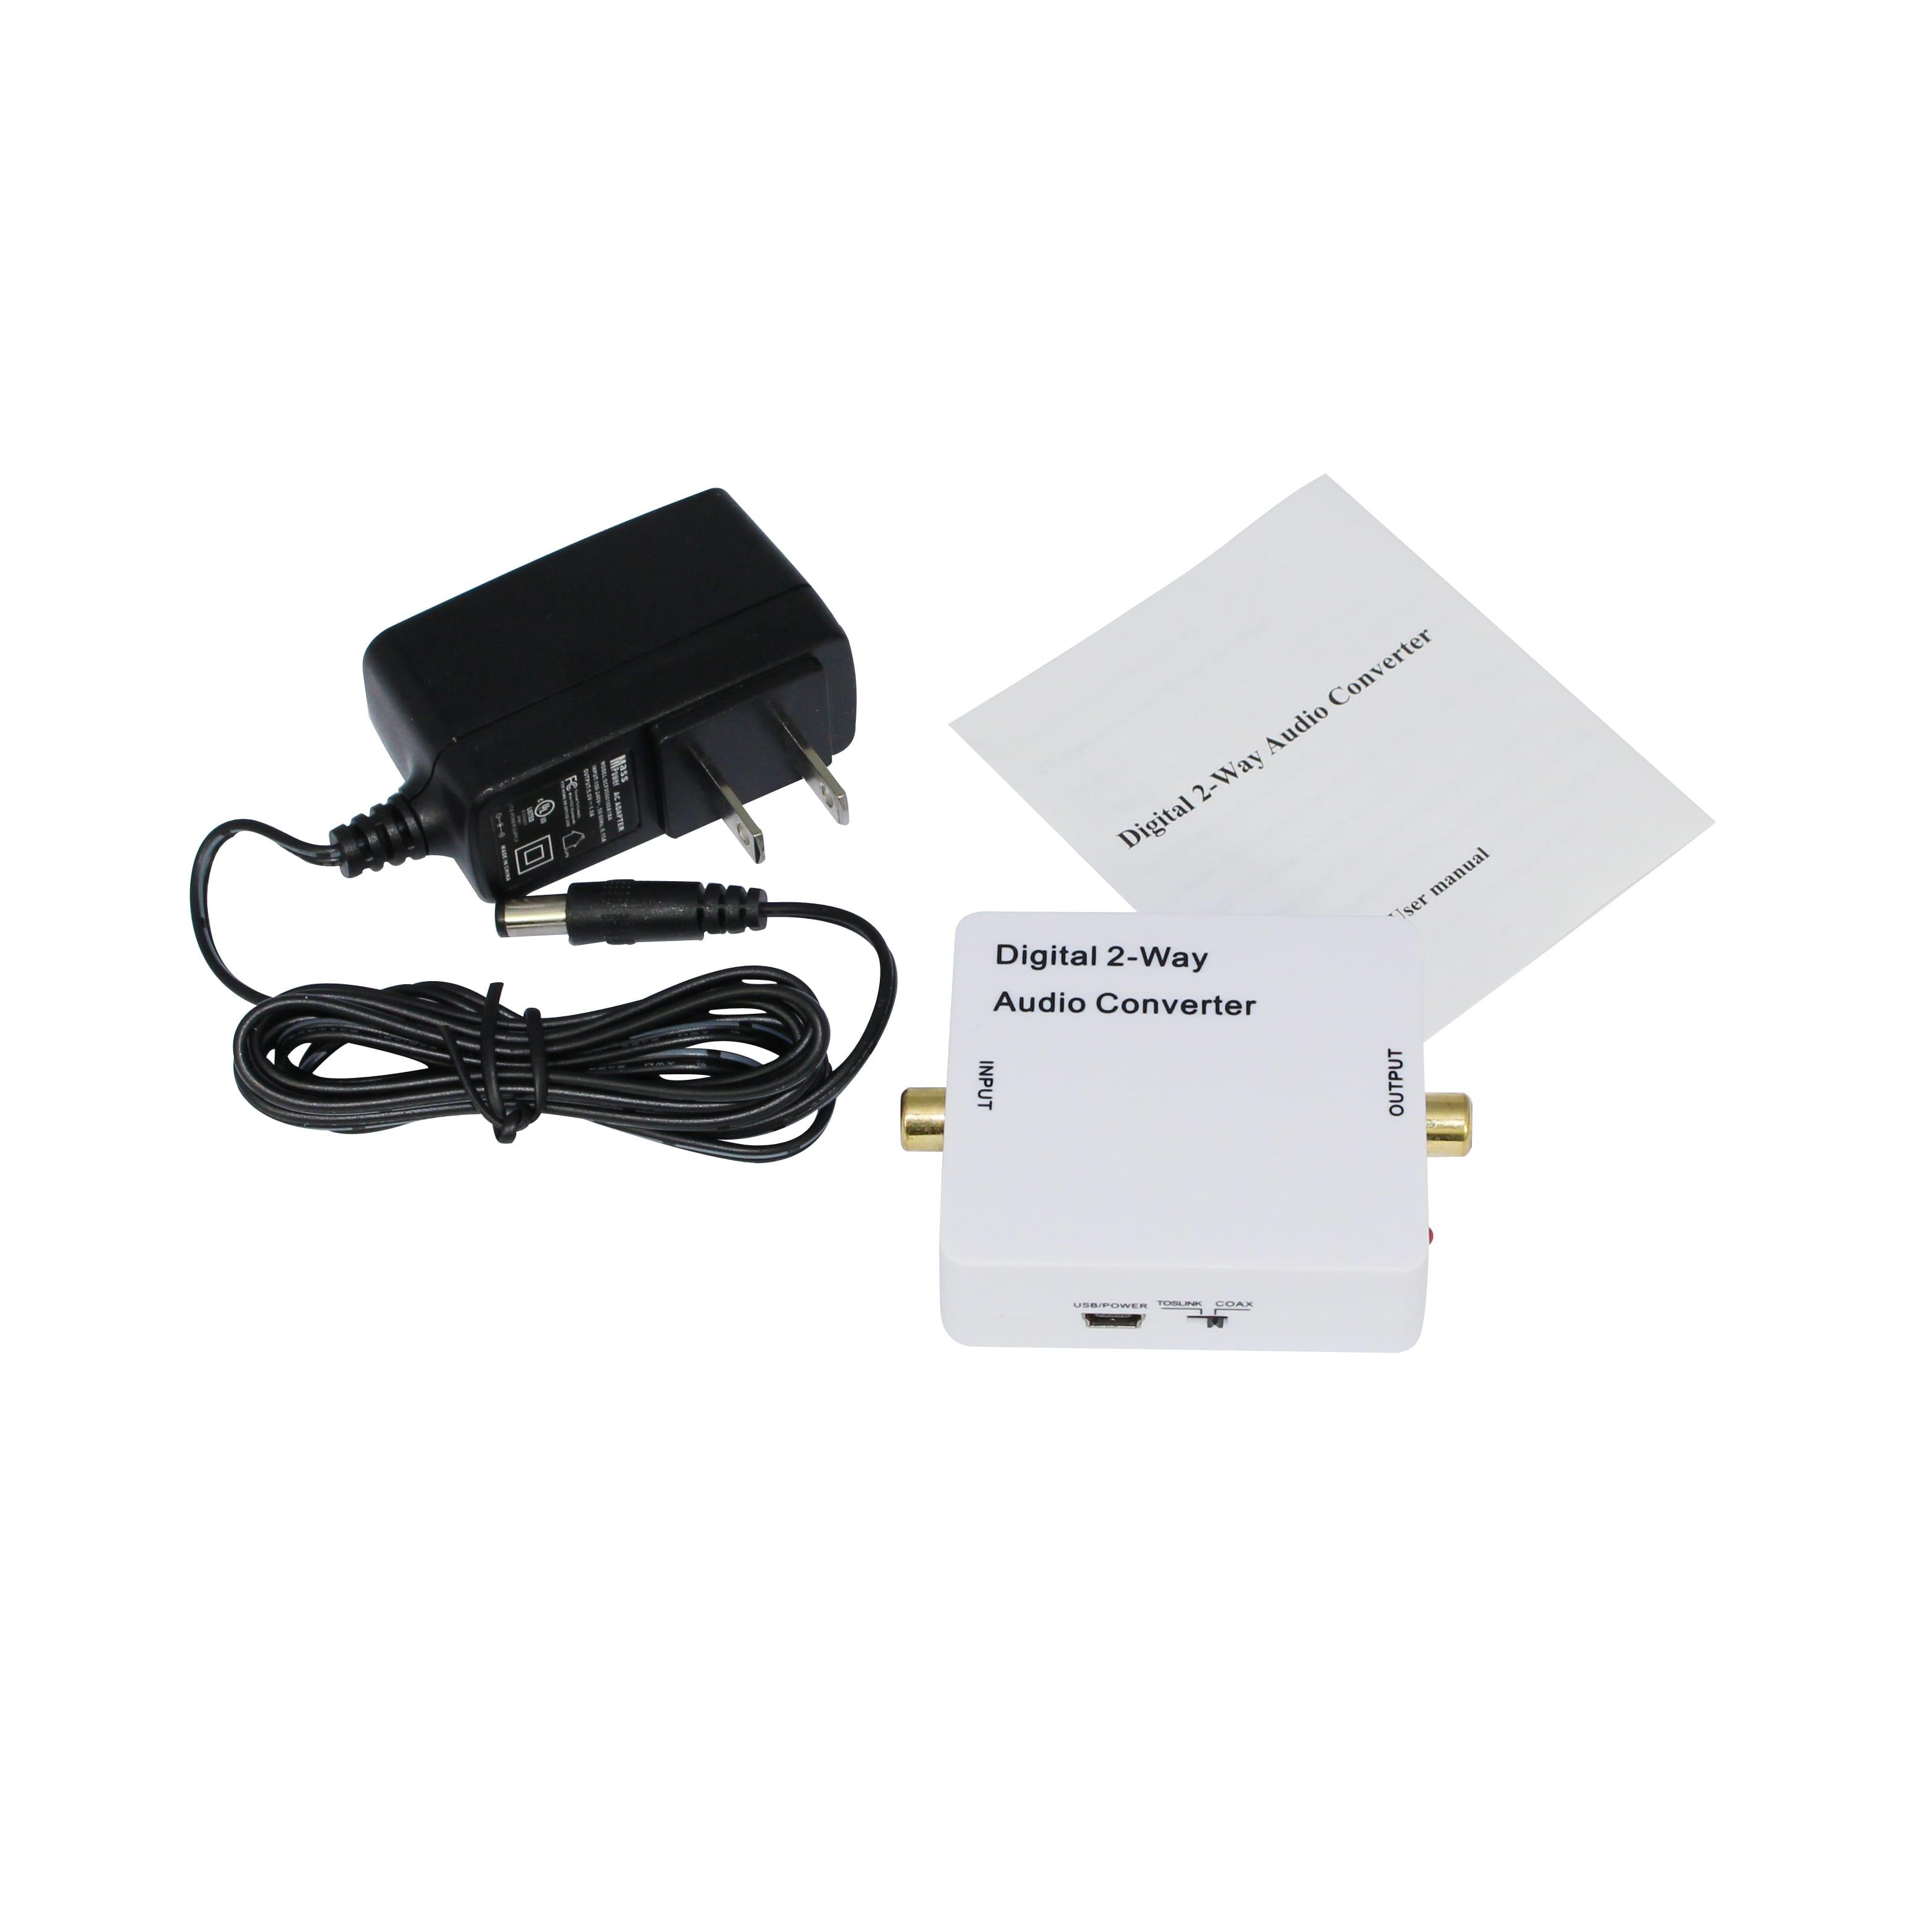 Hdcvt Digital 2 Way Audio Converter Syntech Toslink Switch Sku Hda 2ct